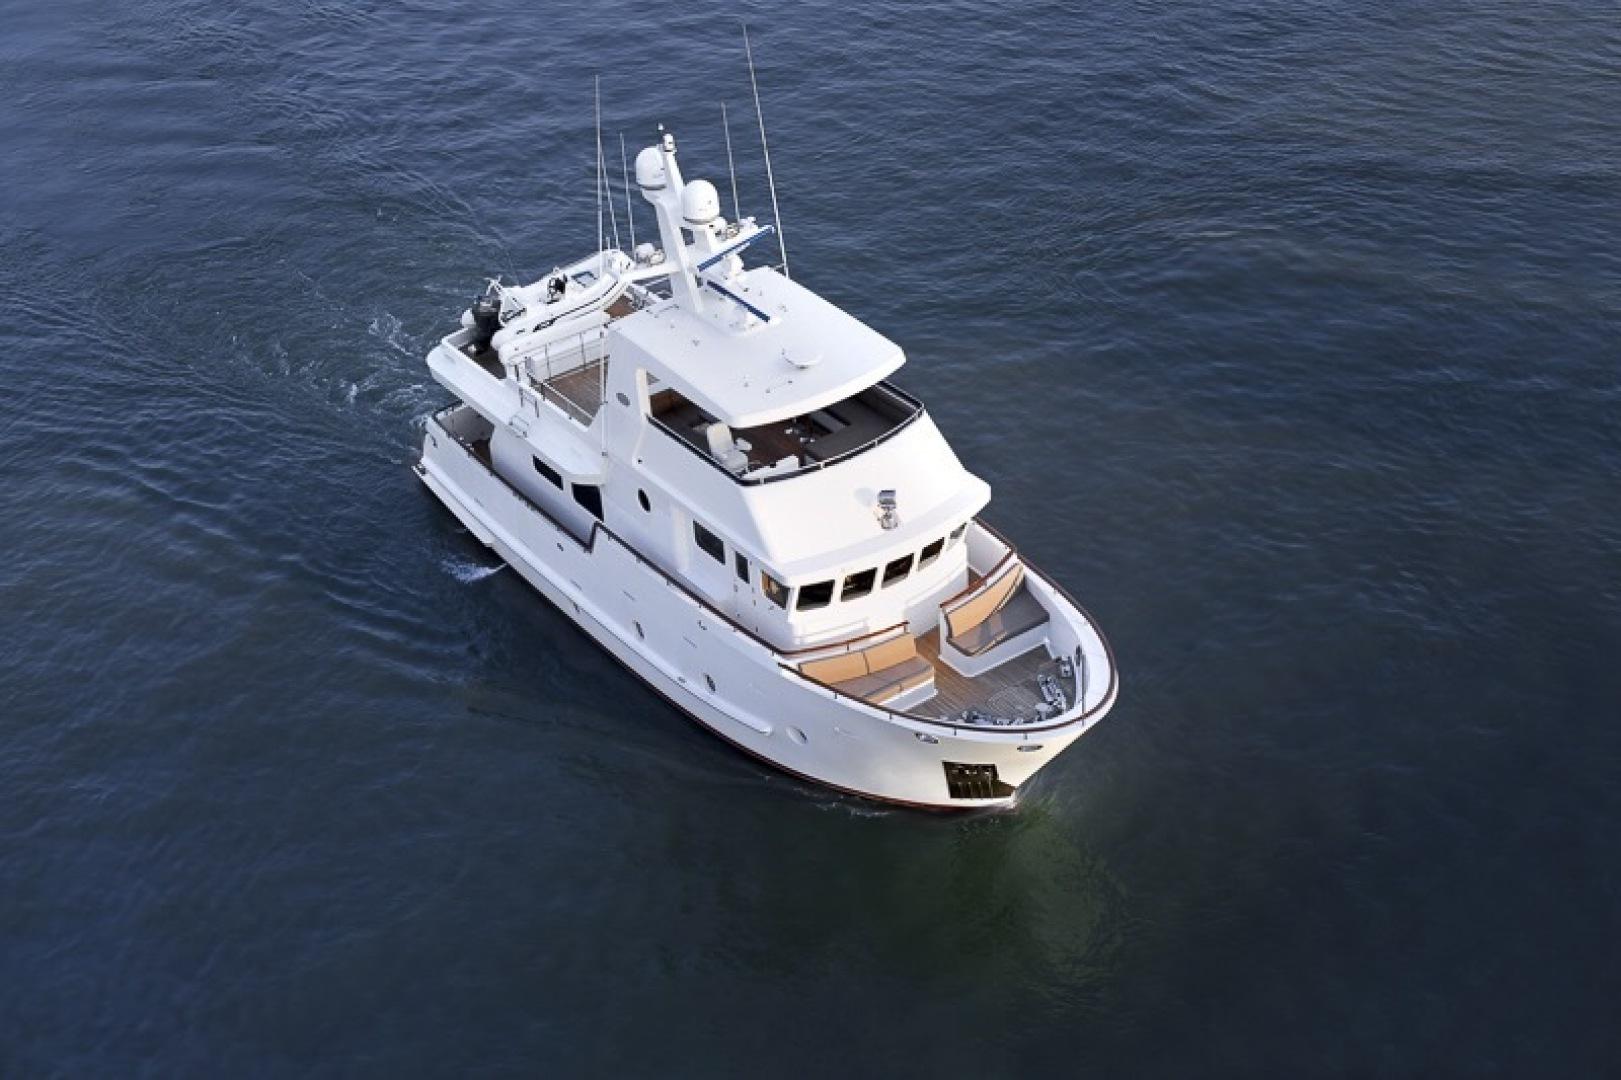 Bering-65 Bering Yacht 2013-Namaste Dania-Florida-United States-1401070   Thumbnail